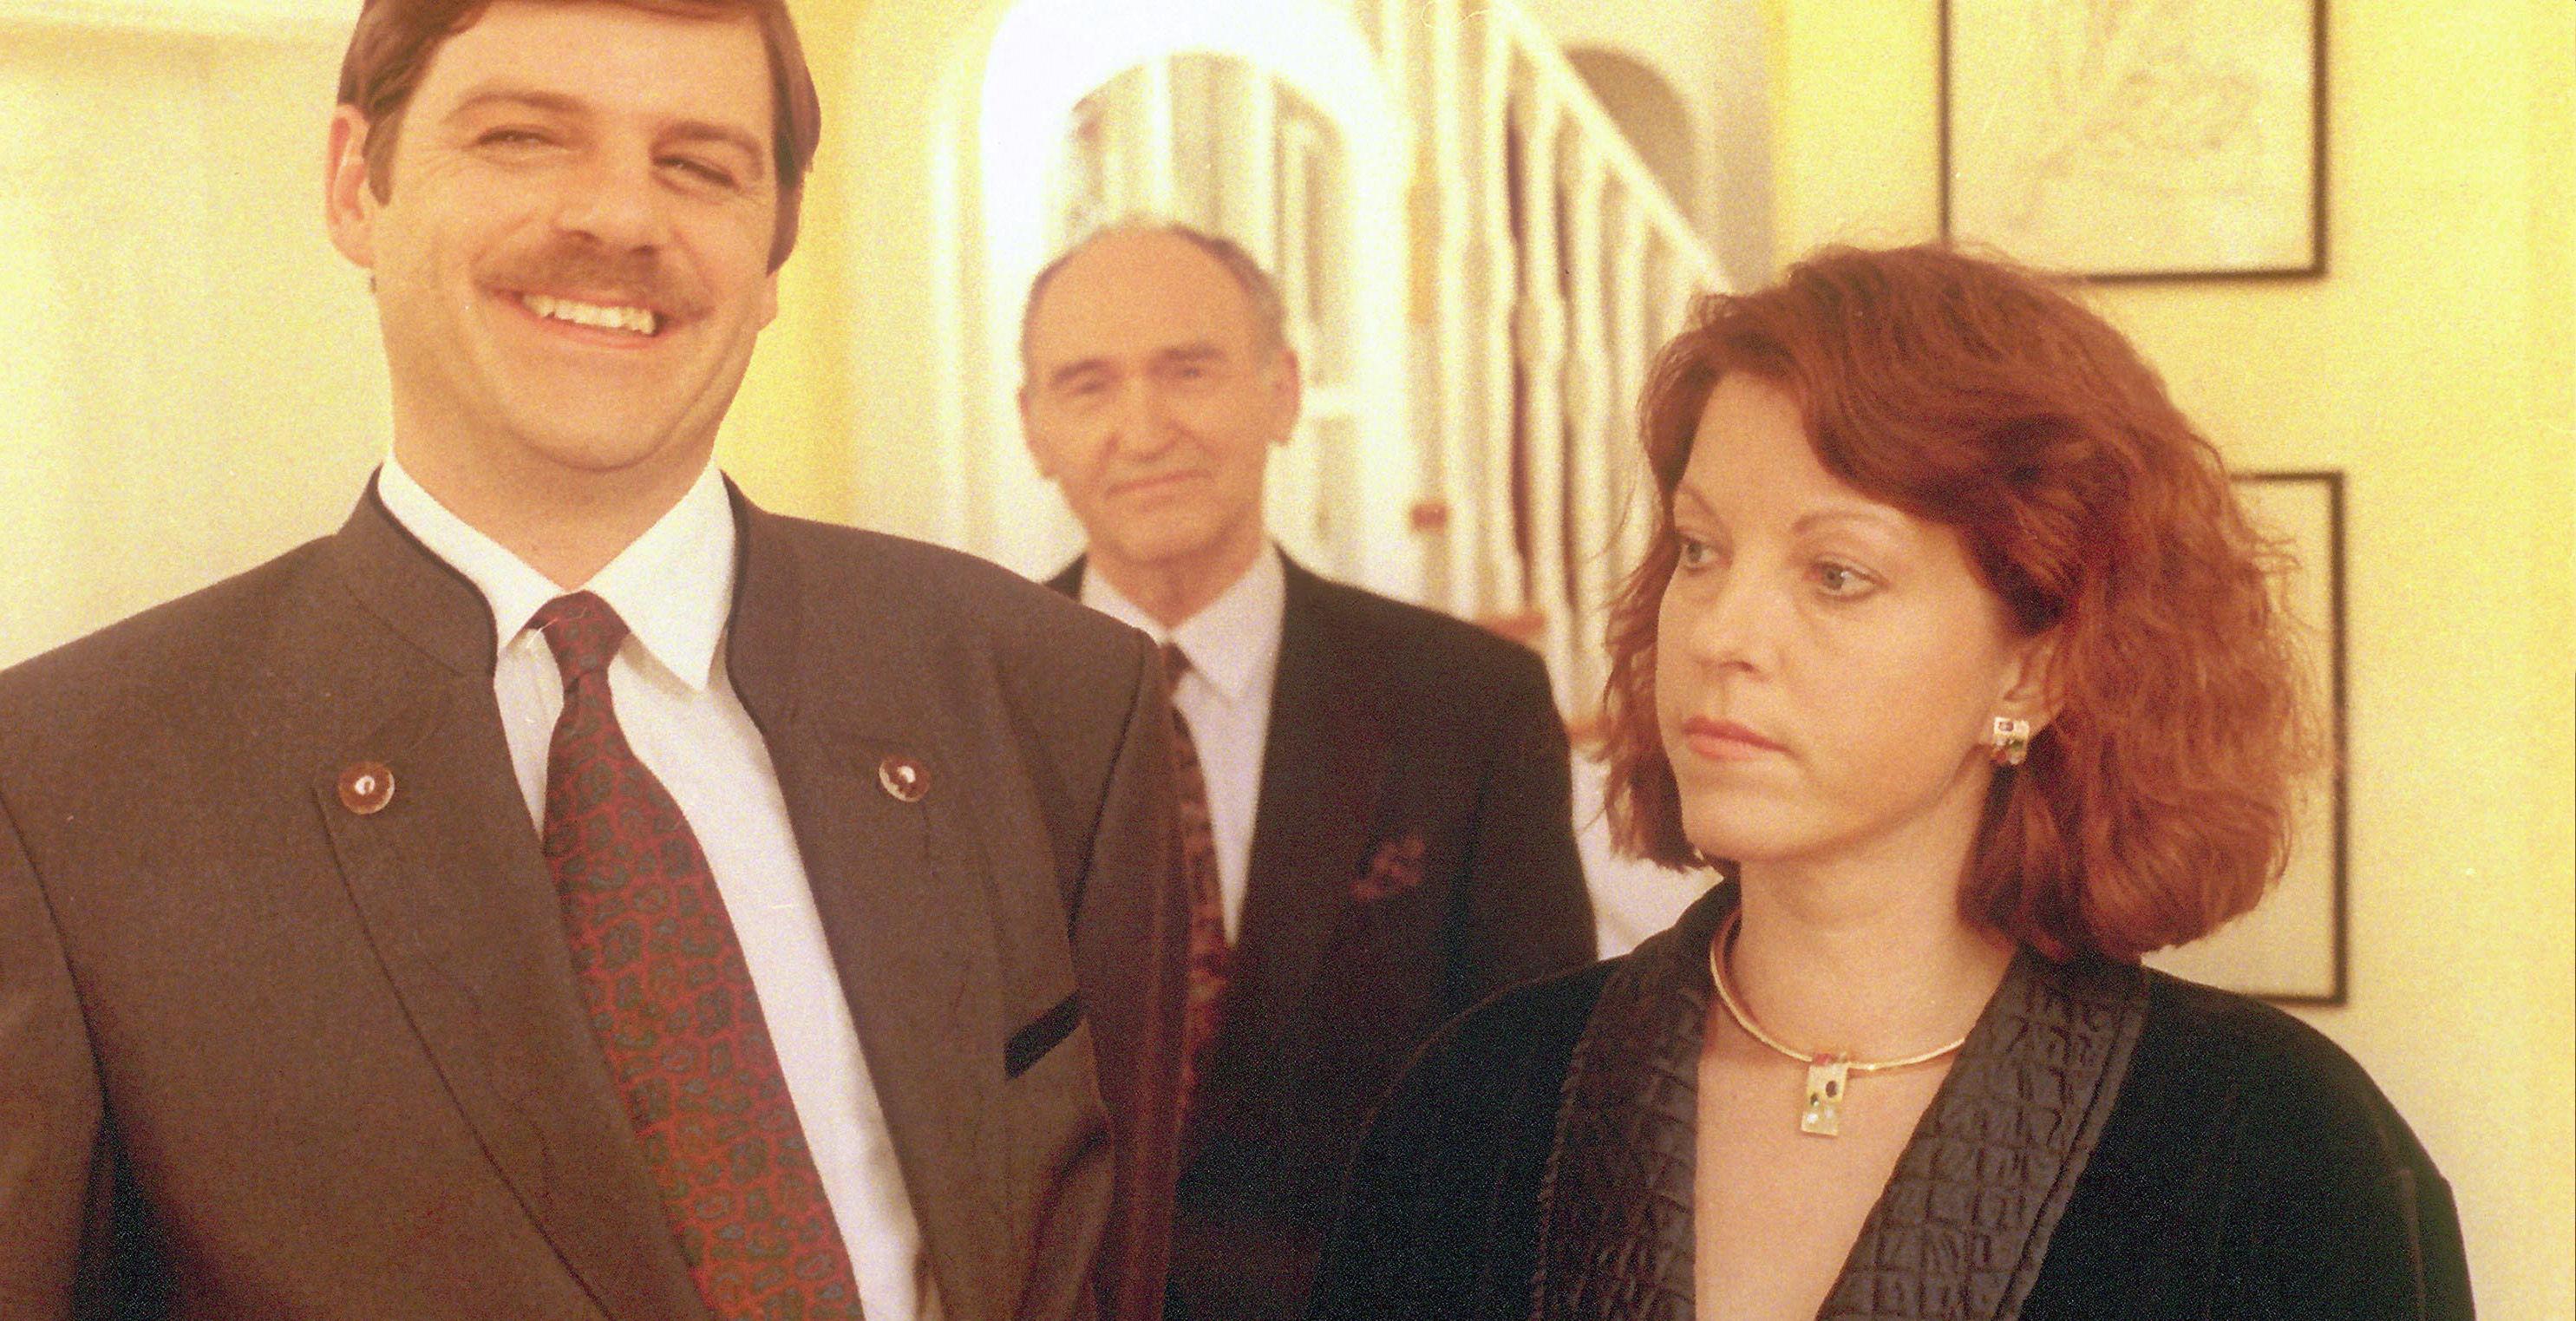 Michael Scheidl (Thomas), Jaromir Borek (Thomas´Vater), Elfi Eschke (Henriette)